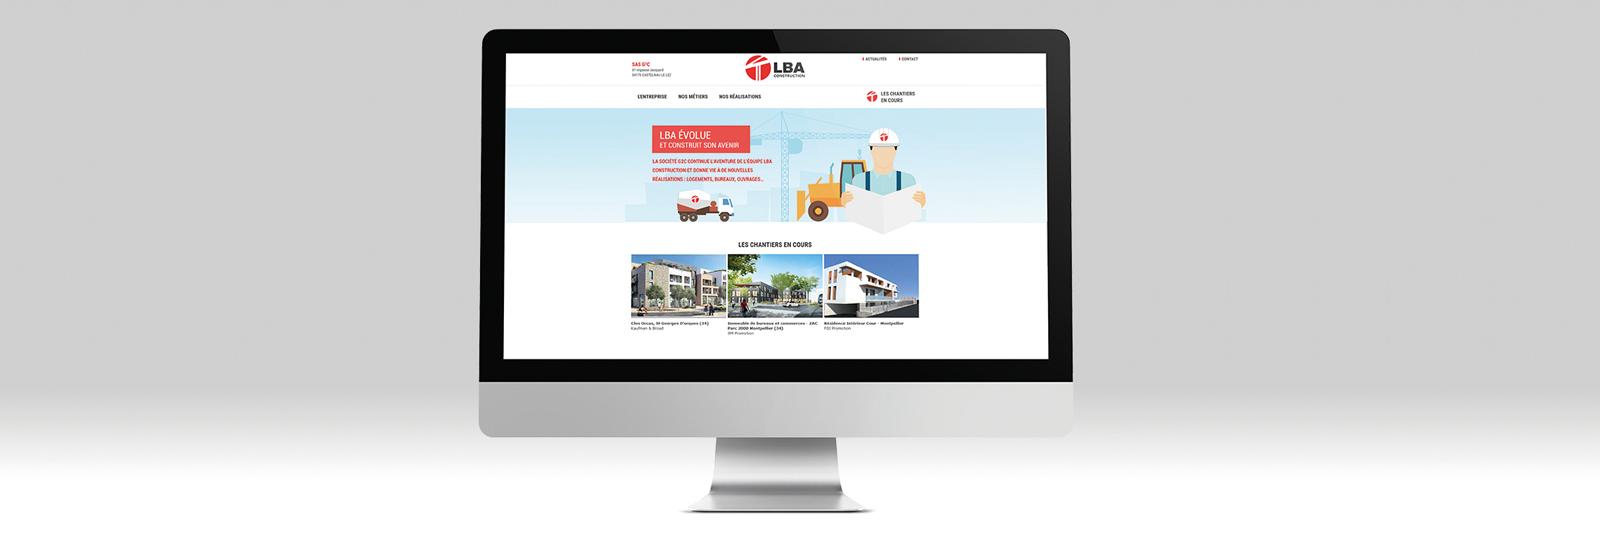 Site internet de LBA